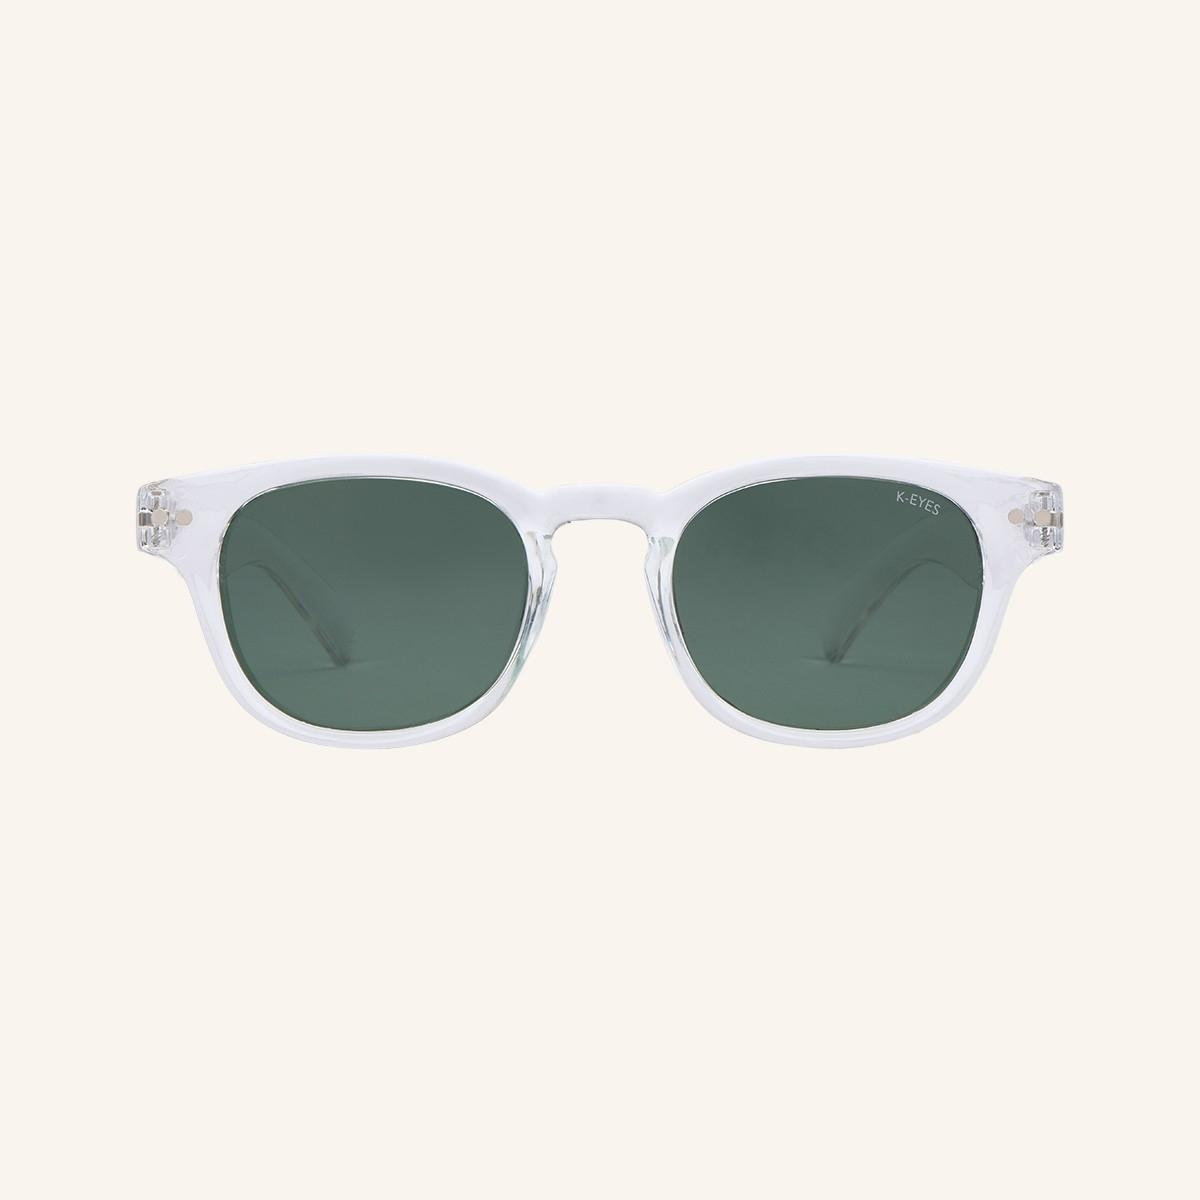 Gafas de sol polarizadas Pantos para Hombre-Mujer